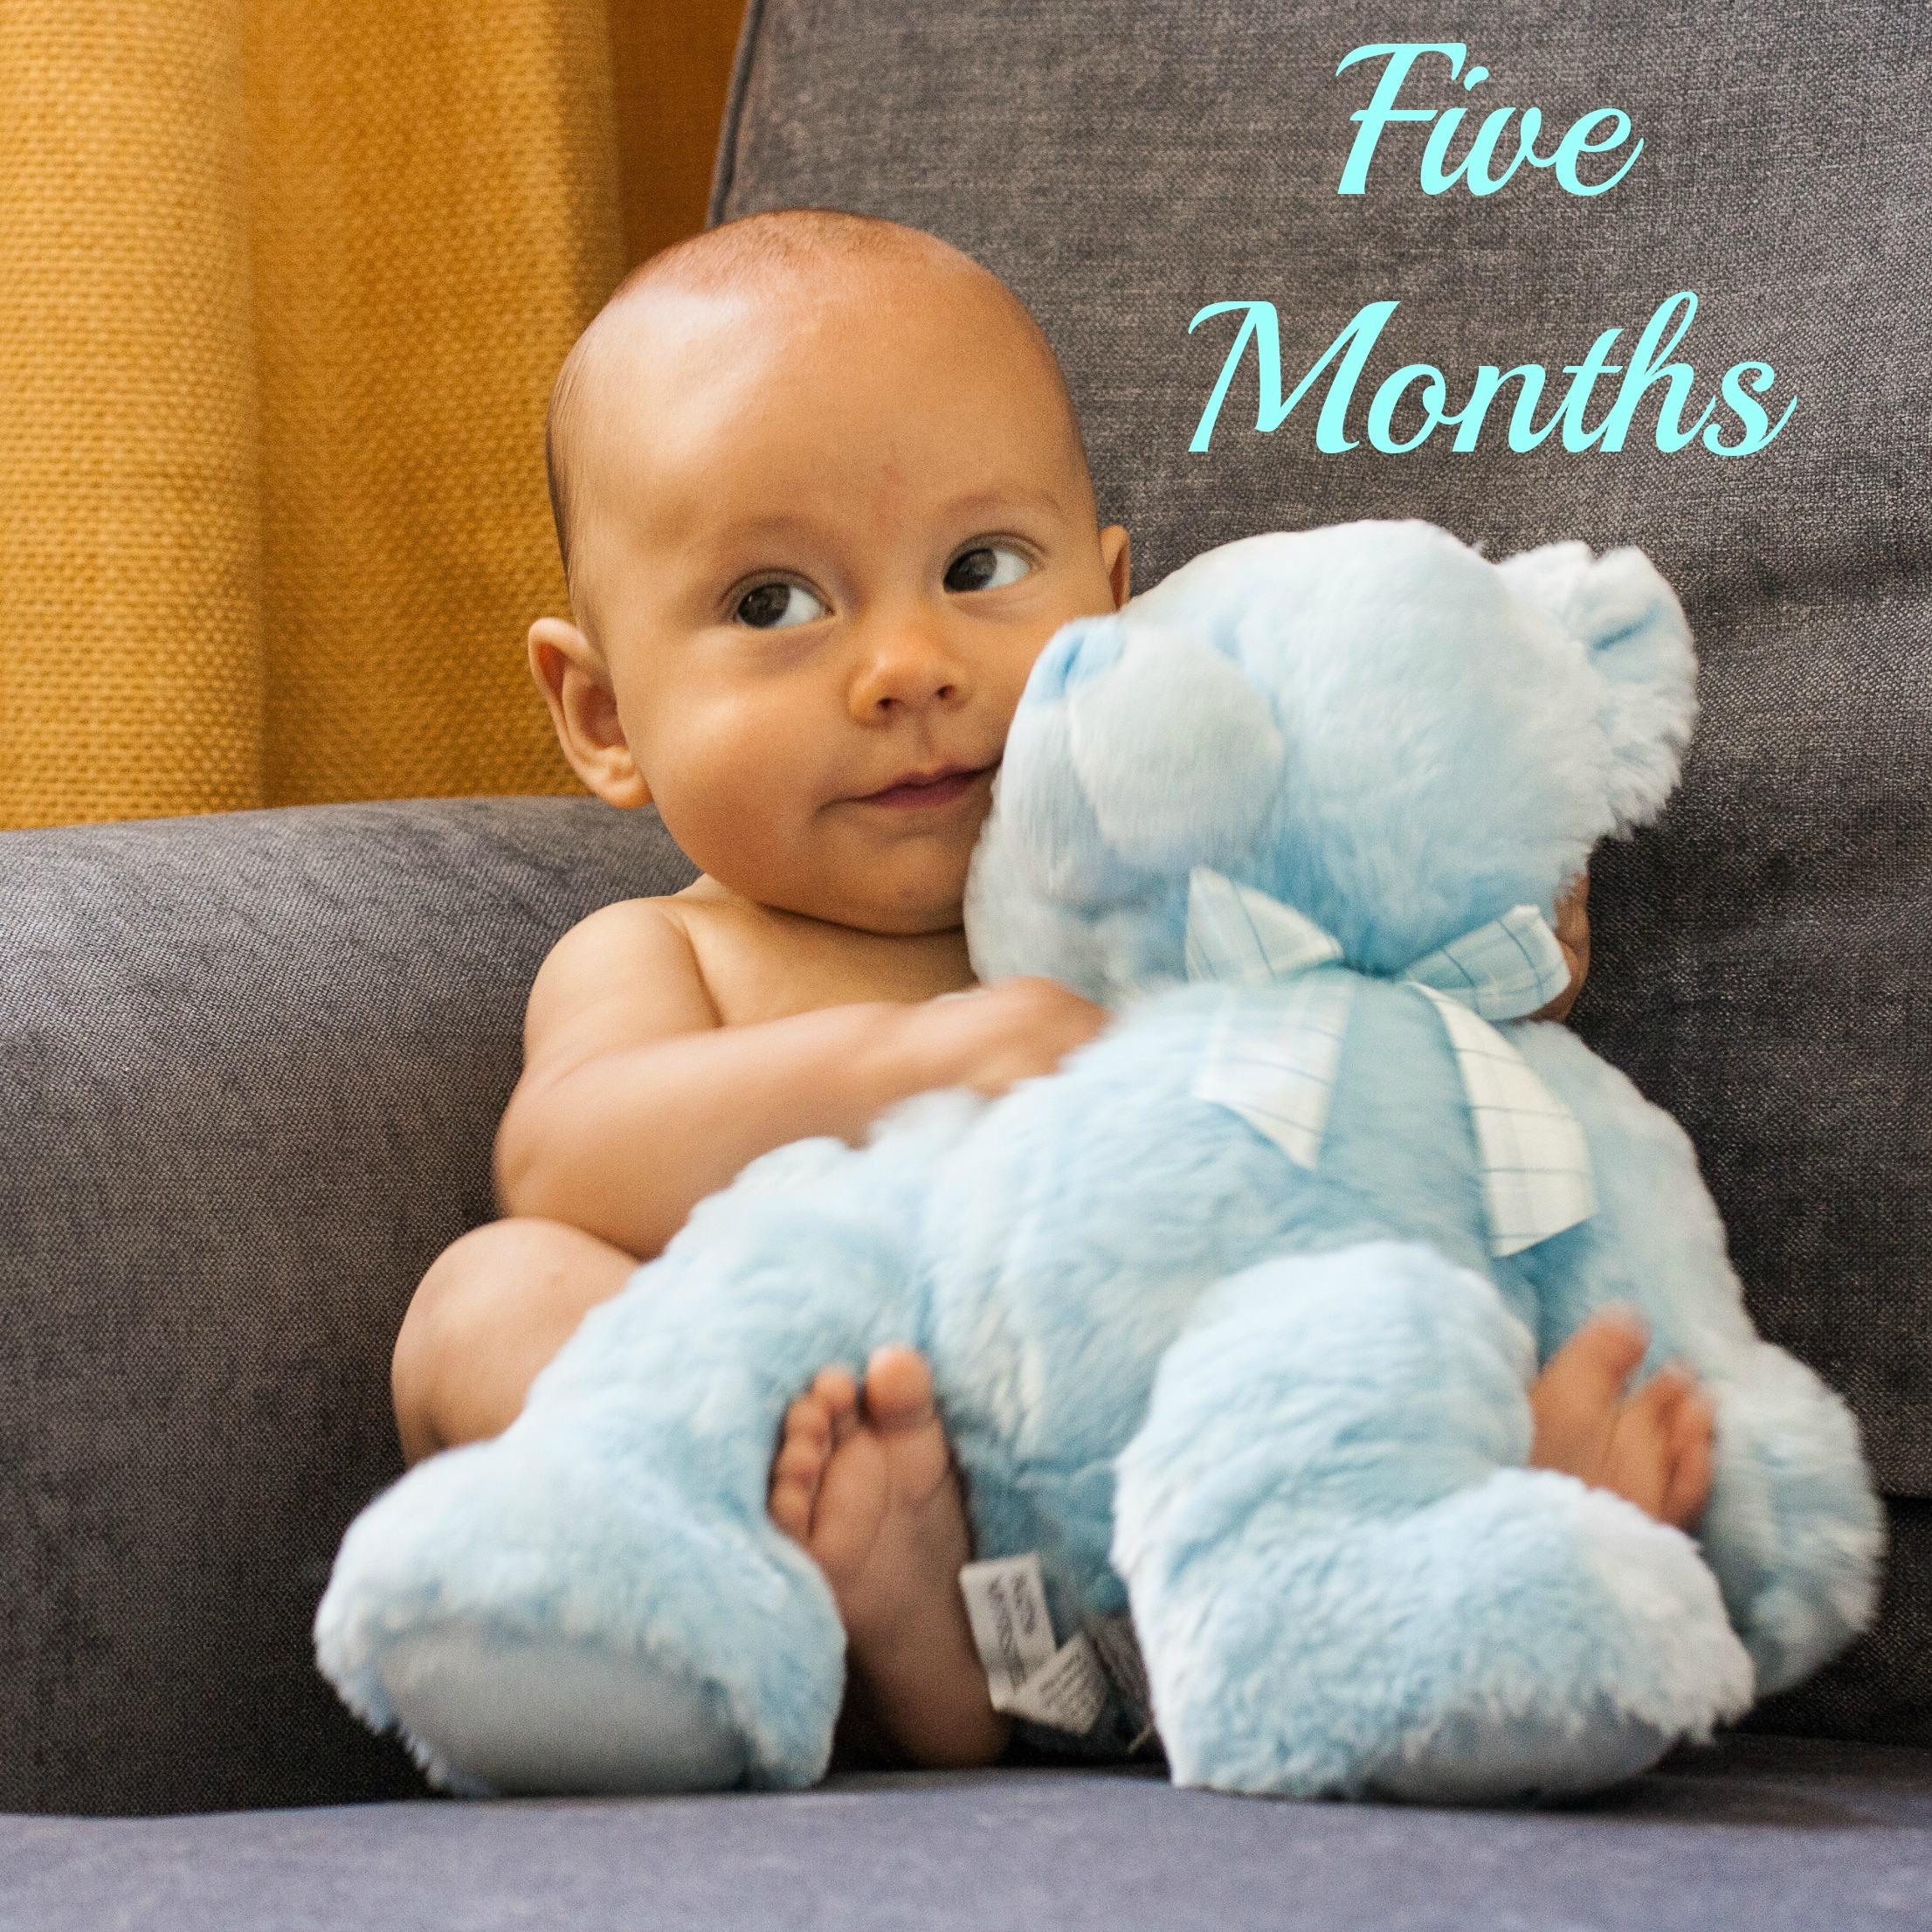 Charleston Michael: Five Months